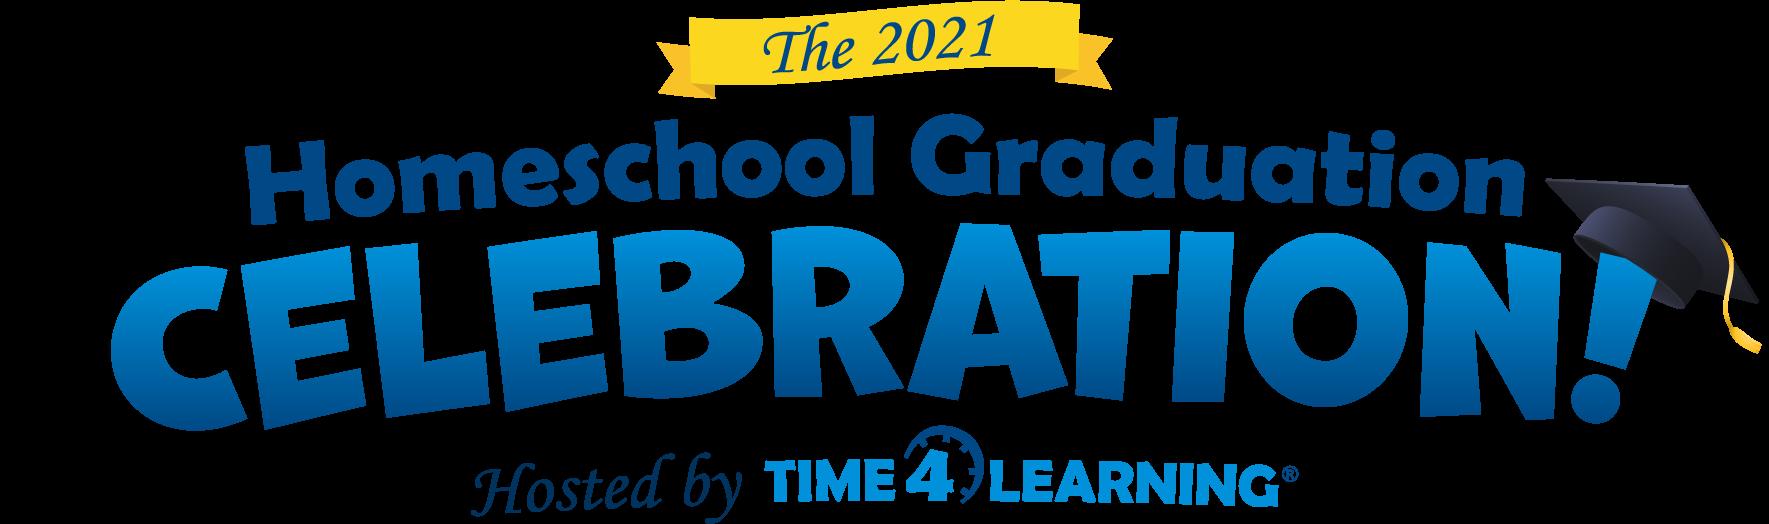 The 2021 Homeschool Graduation Celebration!